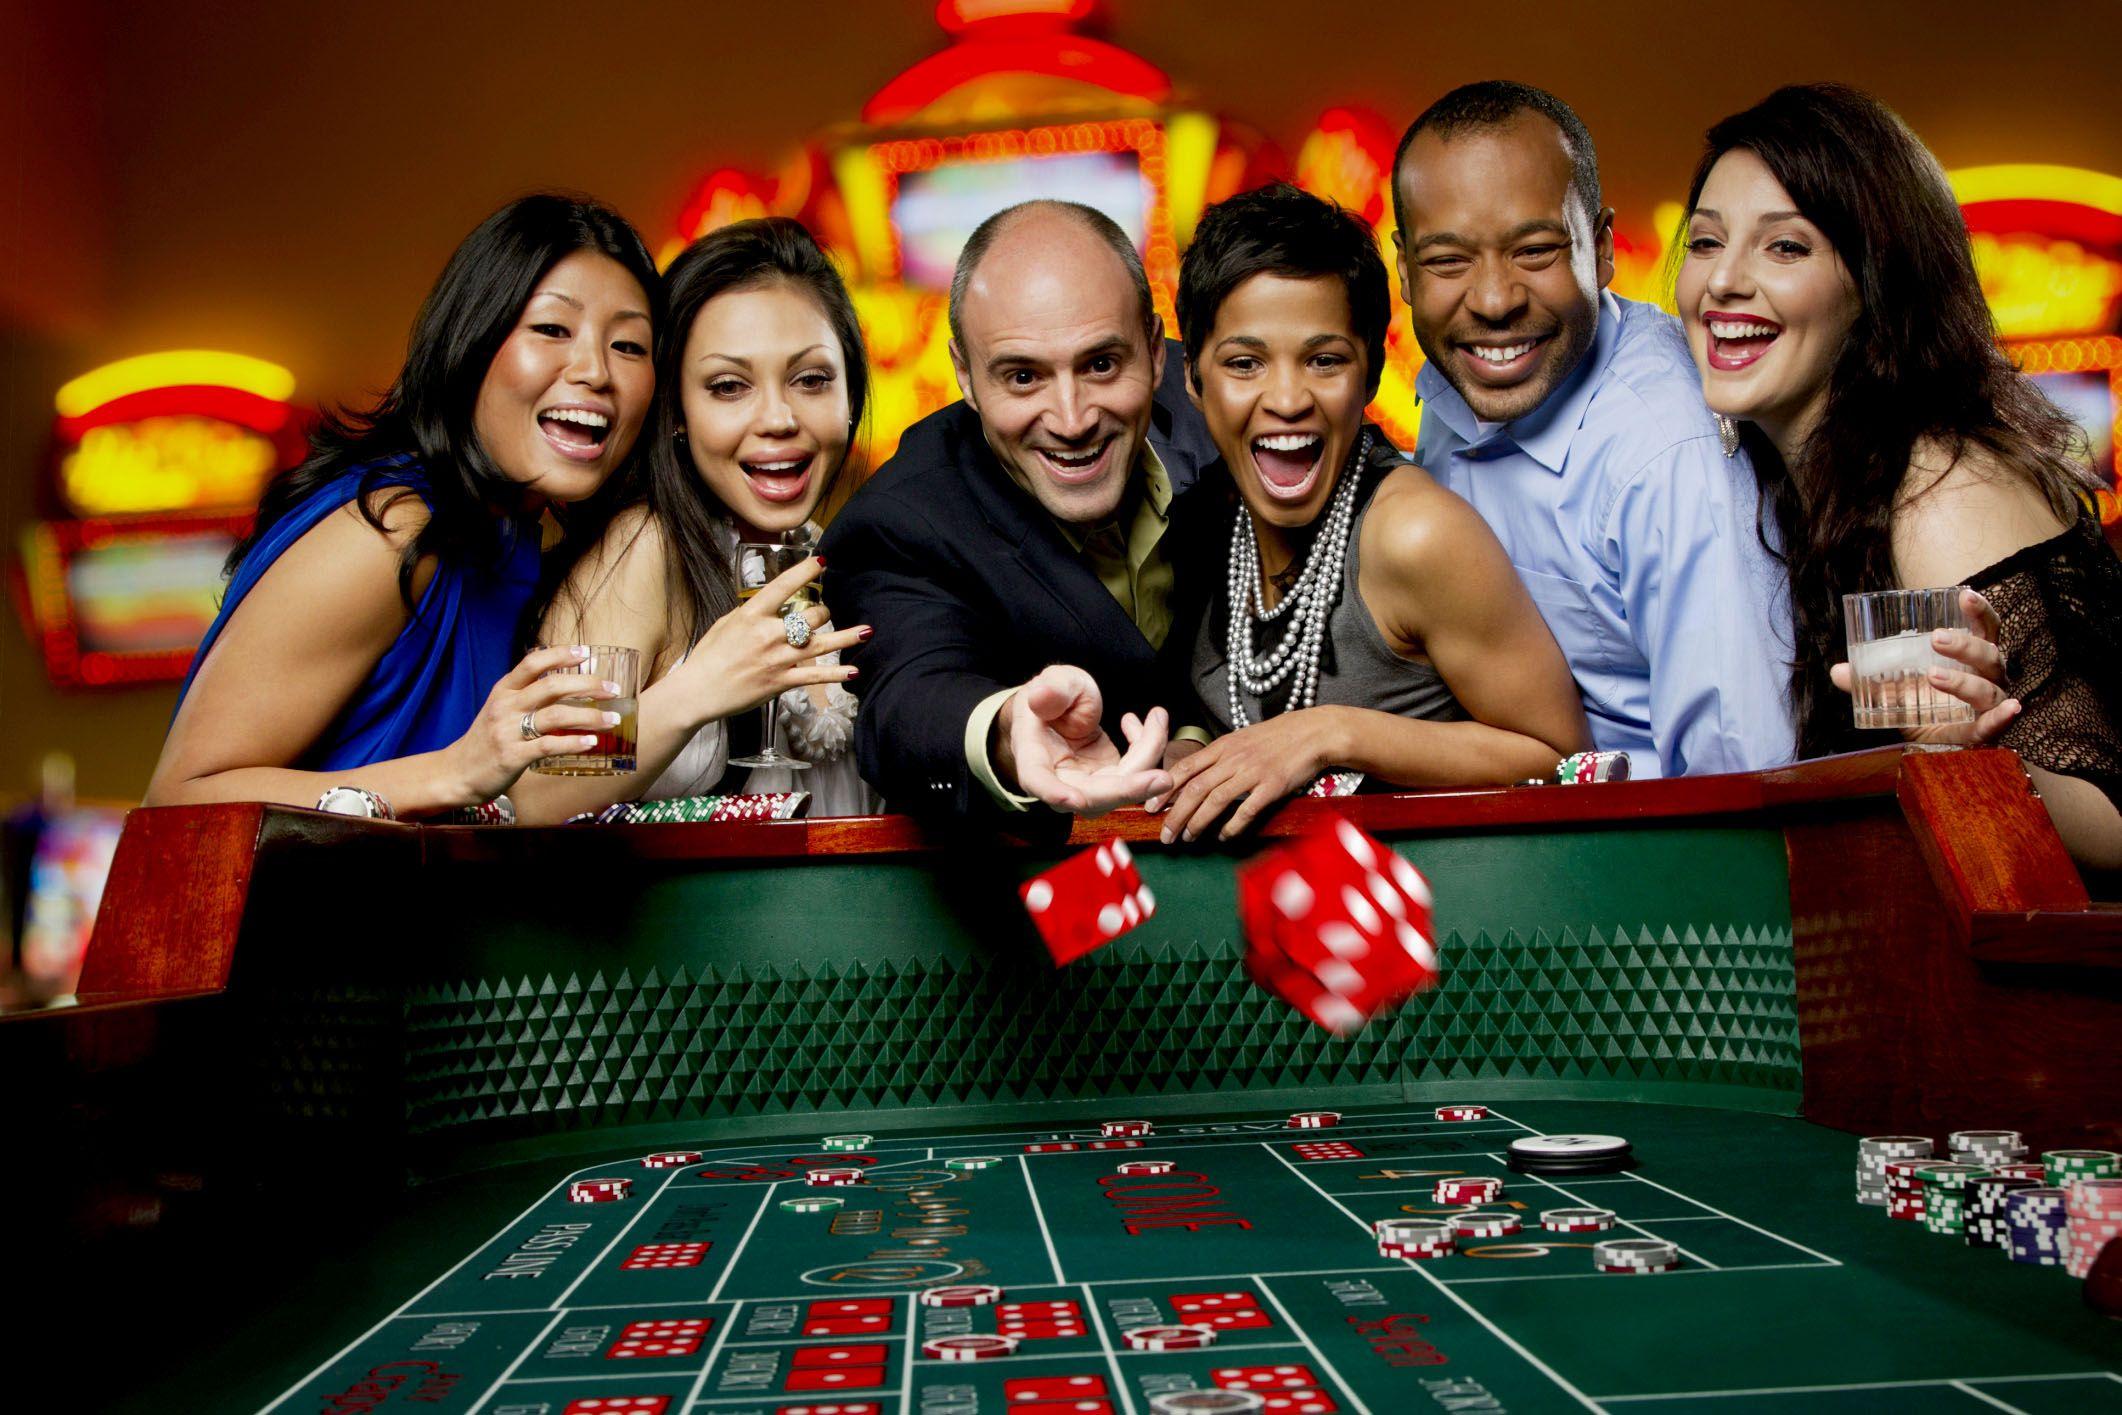 Casino estoril personalizada 44480